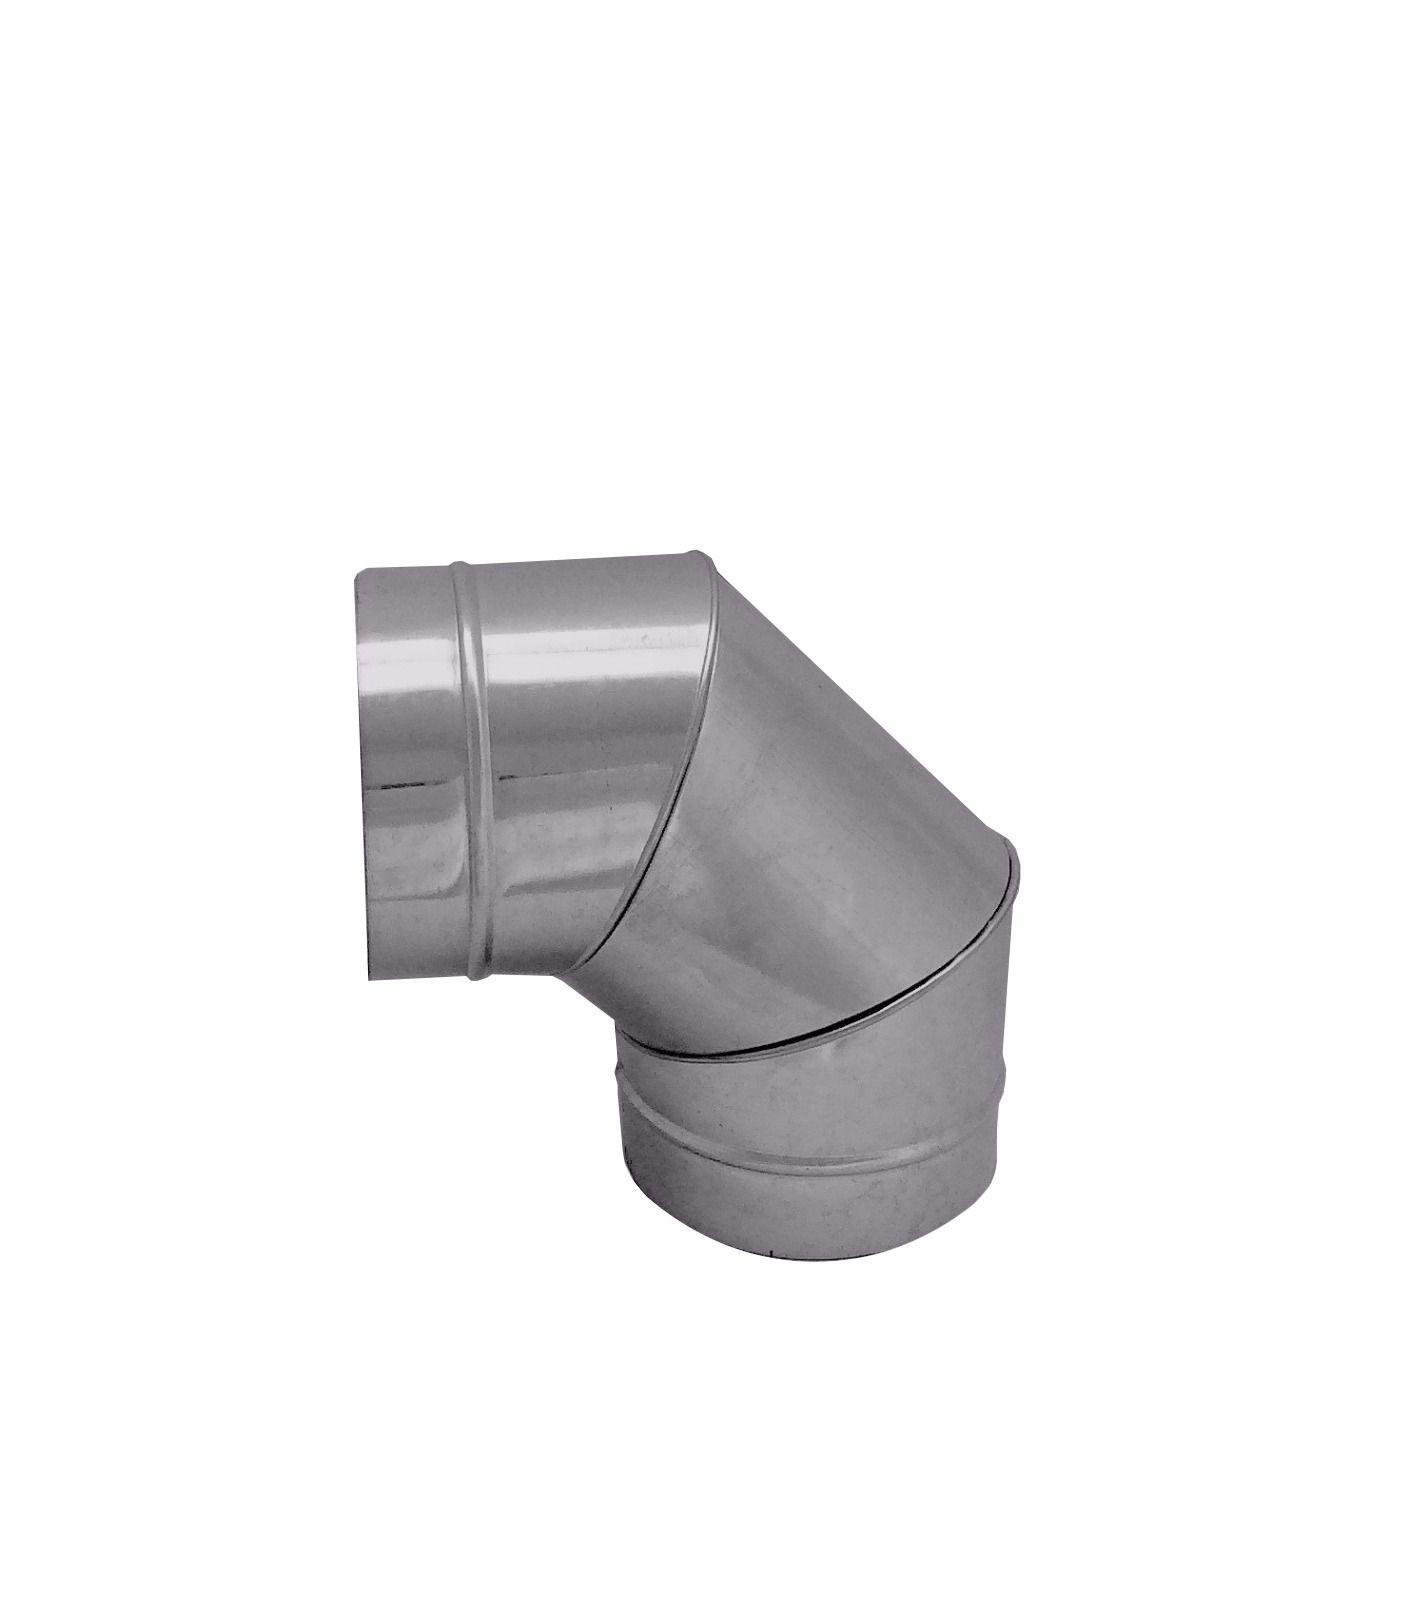 Curva / cotovelo galvanizada 90° de 255 mm de diâmetro  - Galvocalhas